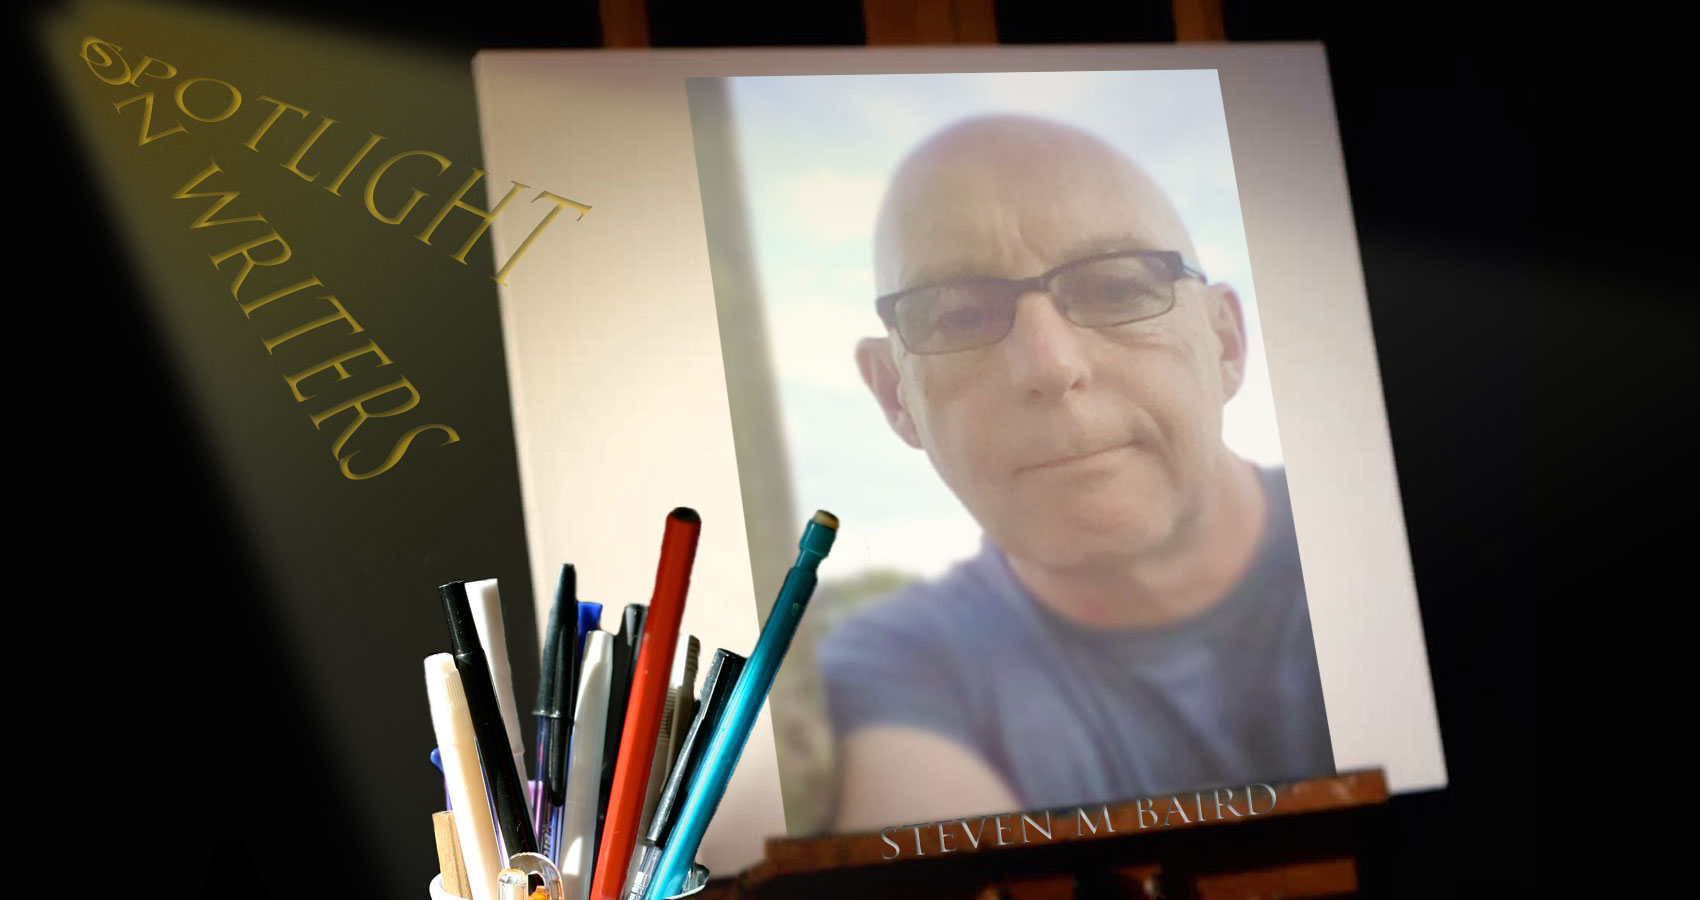 Spotlight On Writers - Steven M Baird, interview at Spillwords.com